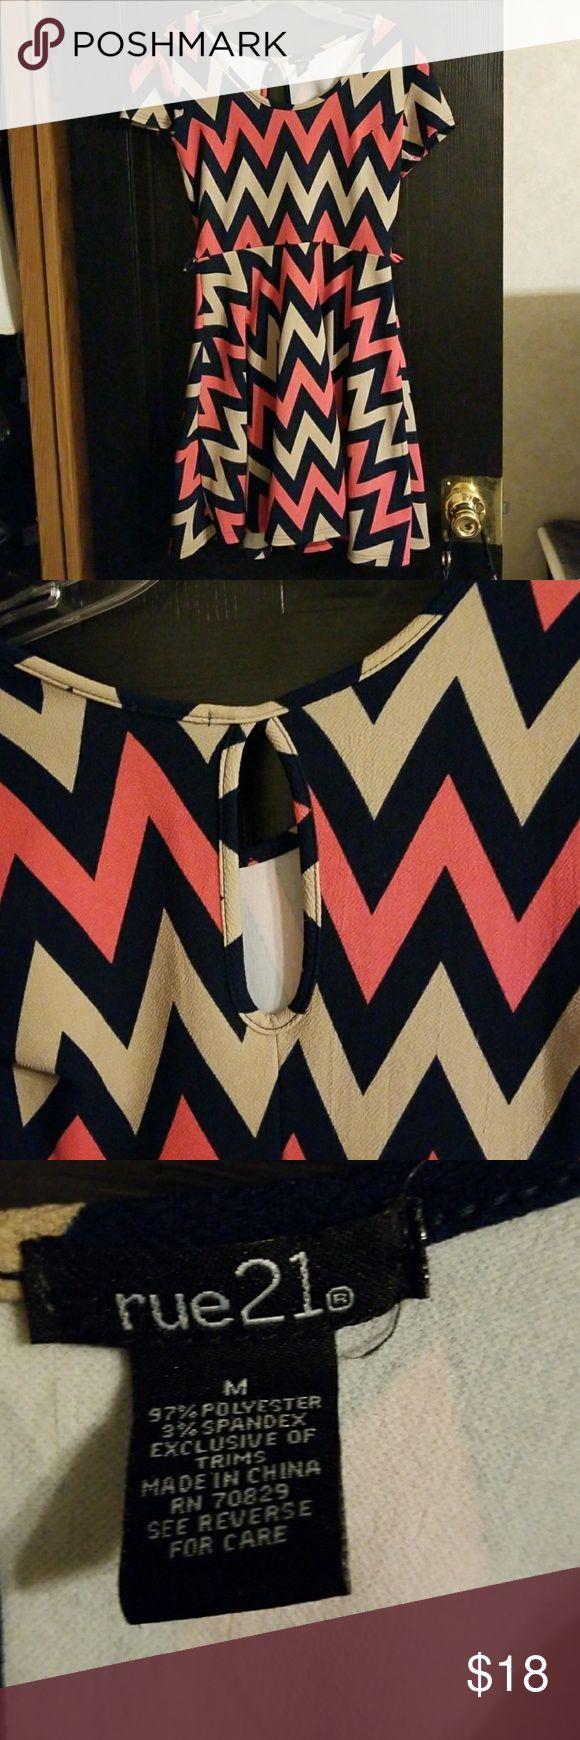 Chevron print knit dress Rue21 chevron print dress. Knit material easy care super comfy. Navy, coral and tan size medium Rue 21 Dresses Mini